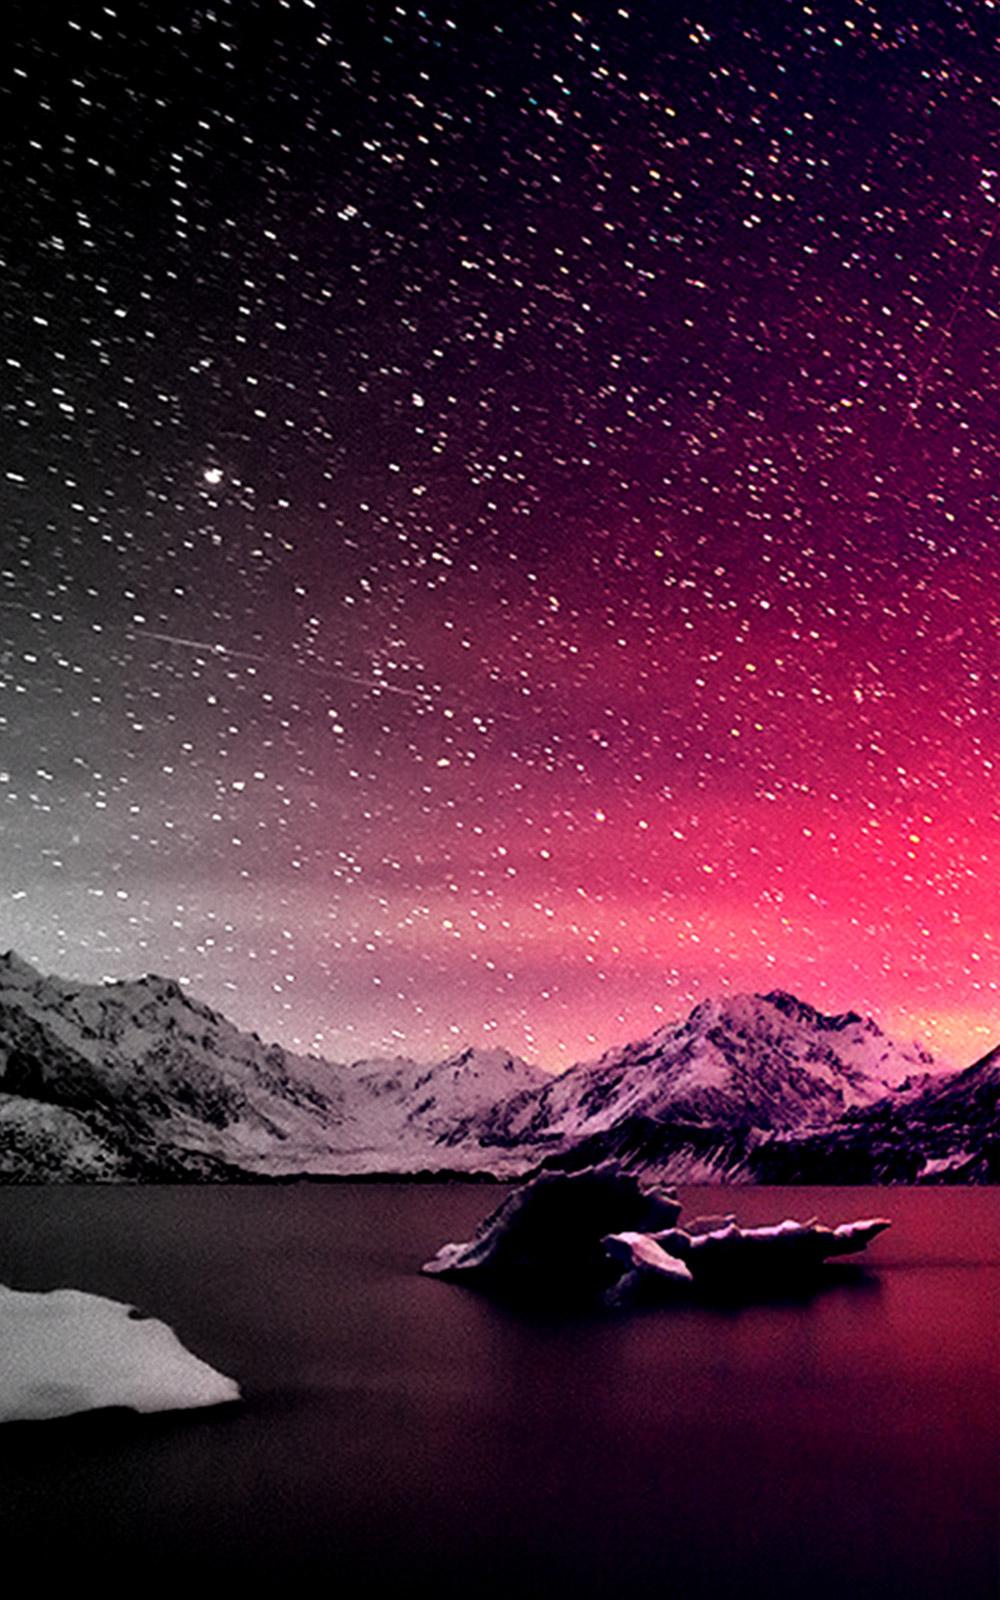 Sky Wallpapers: [91+] Pink Sky Wallpapers On WallpaperSafari